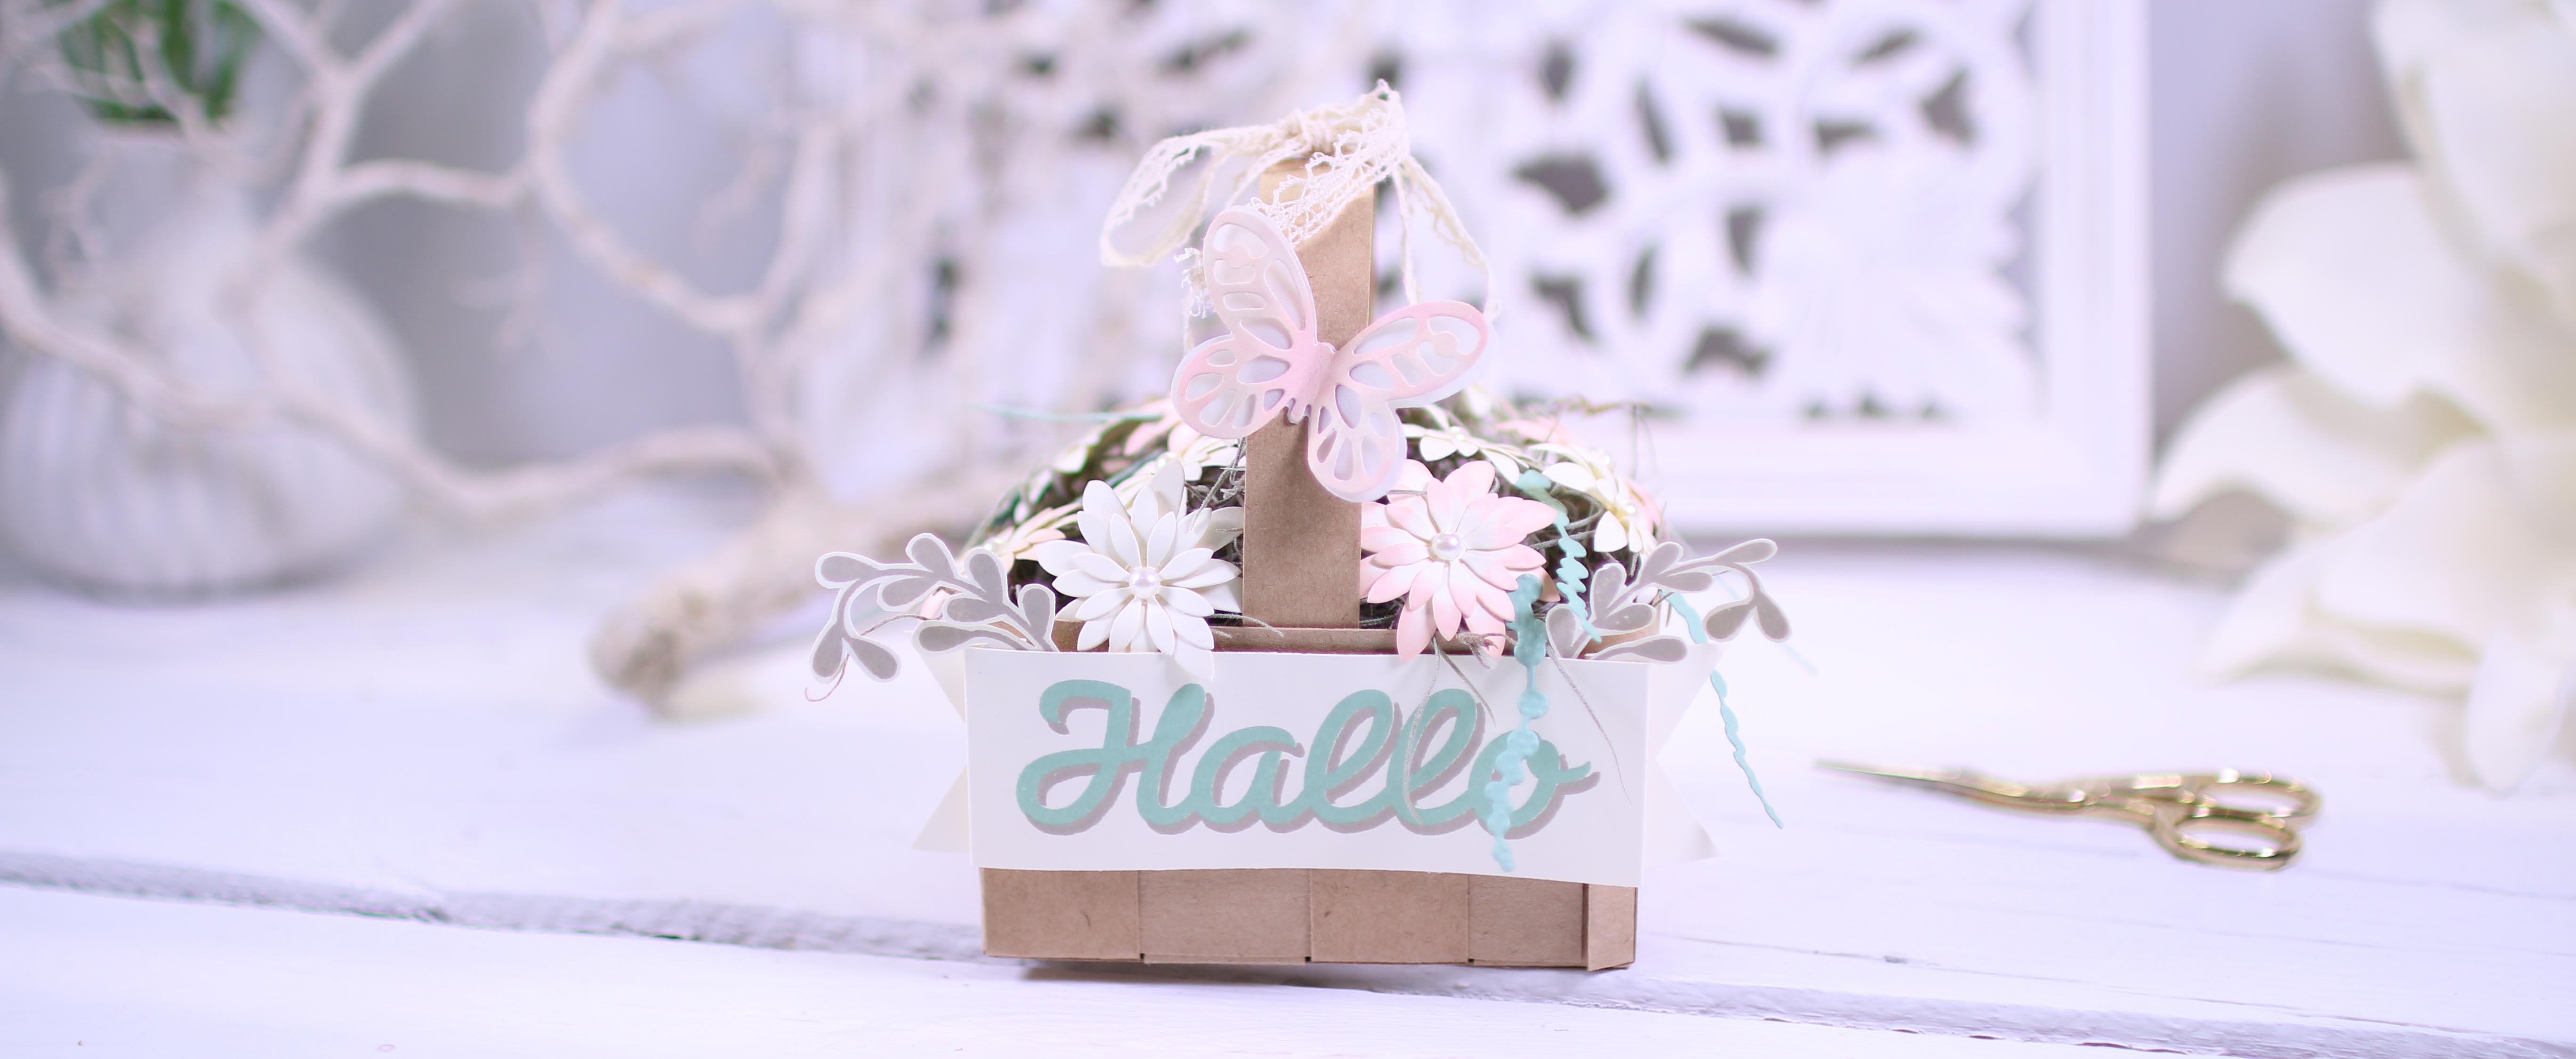 Team-Blog Hop Stempelherz – Thema: Muttertag – Blumenkorb